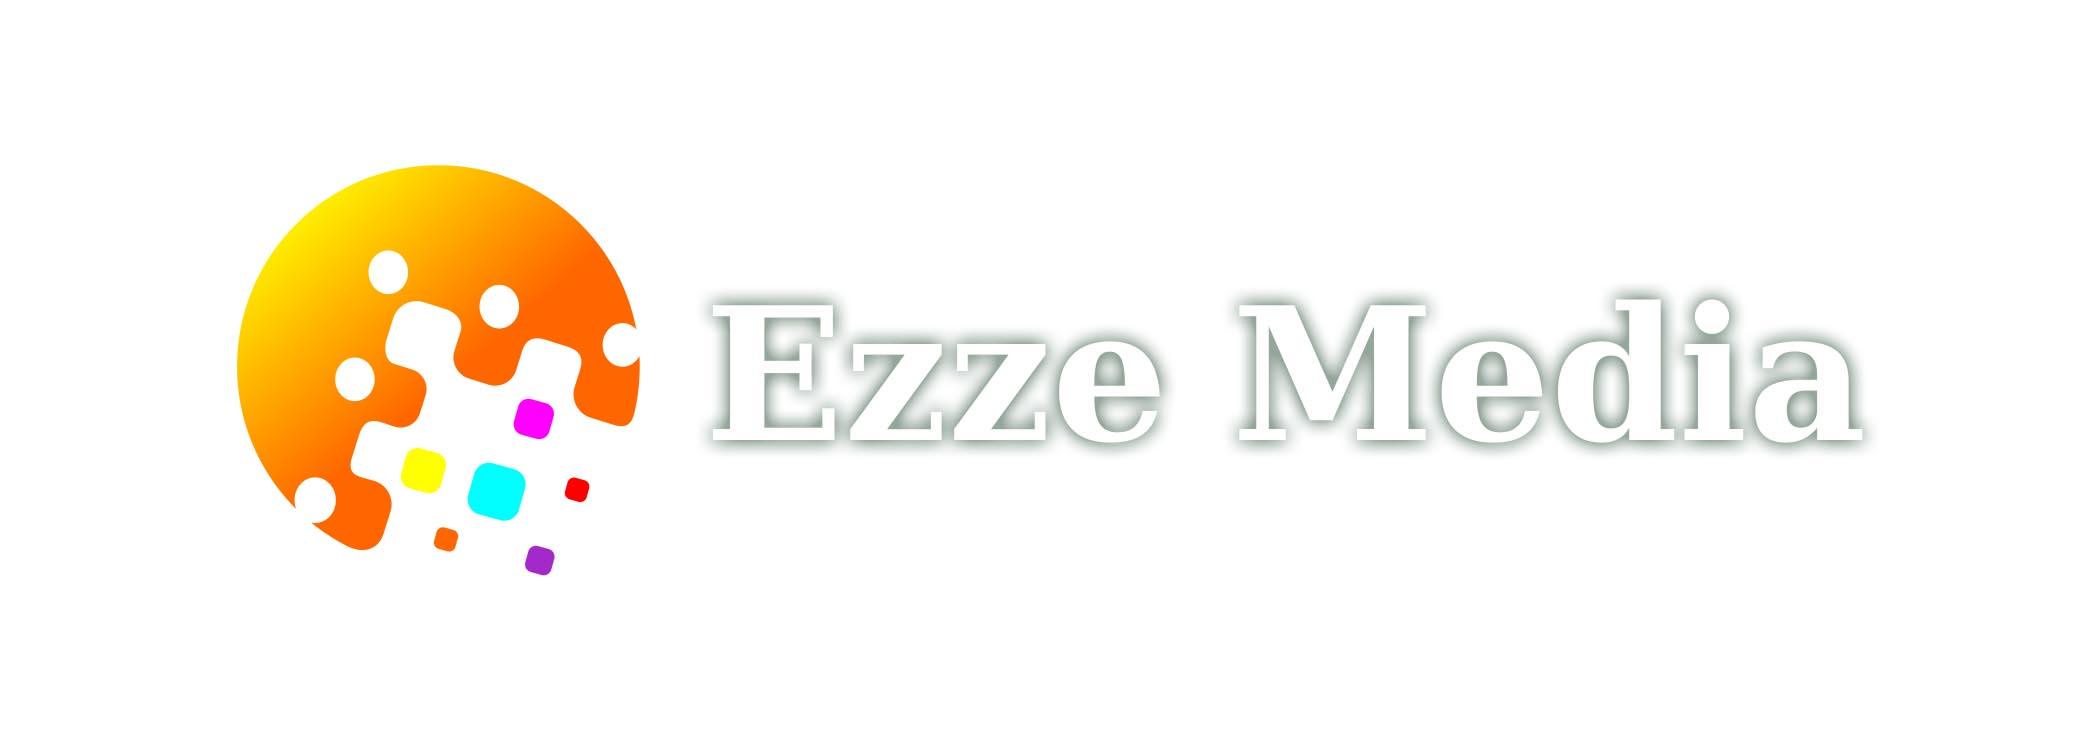 Ezze Media